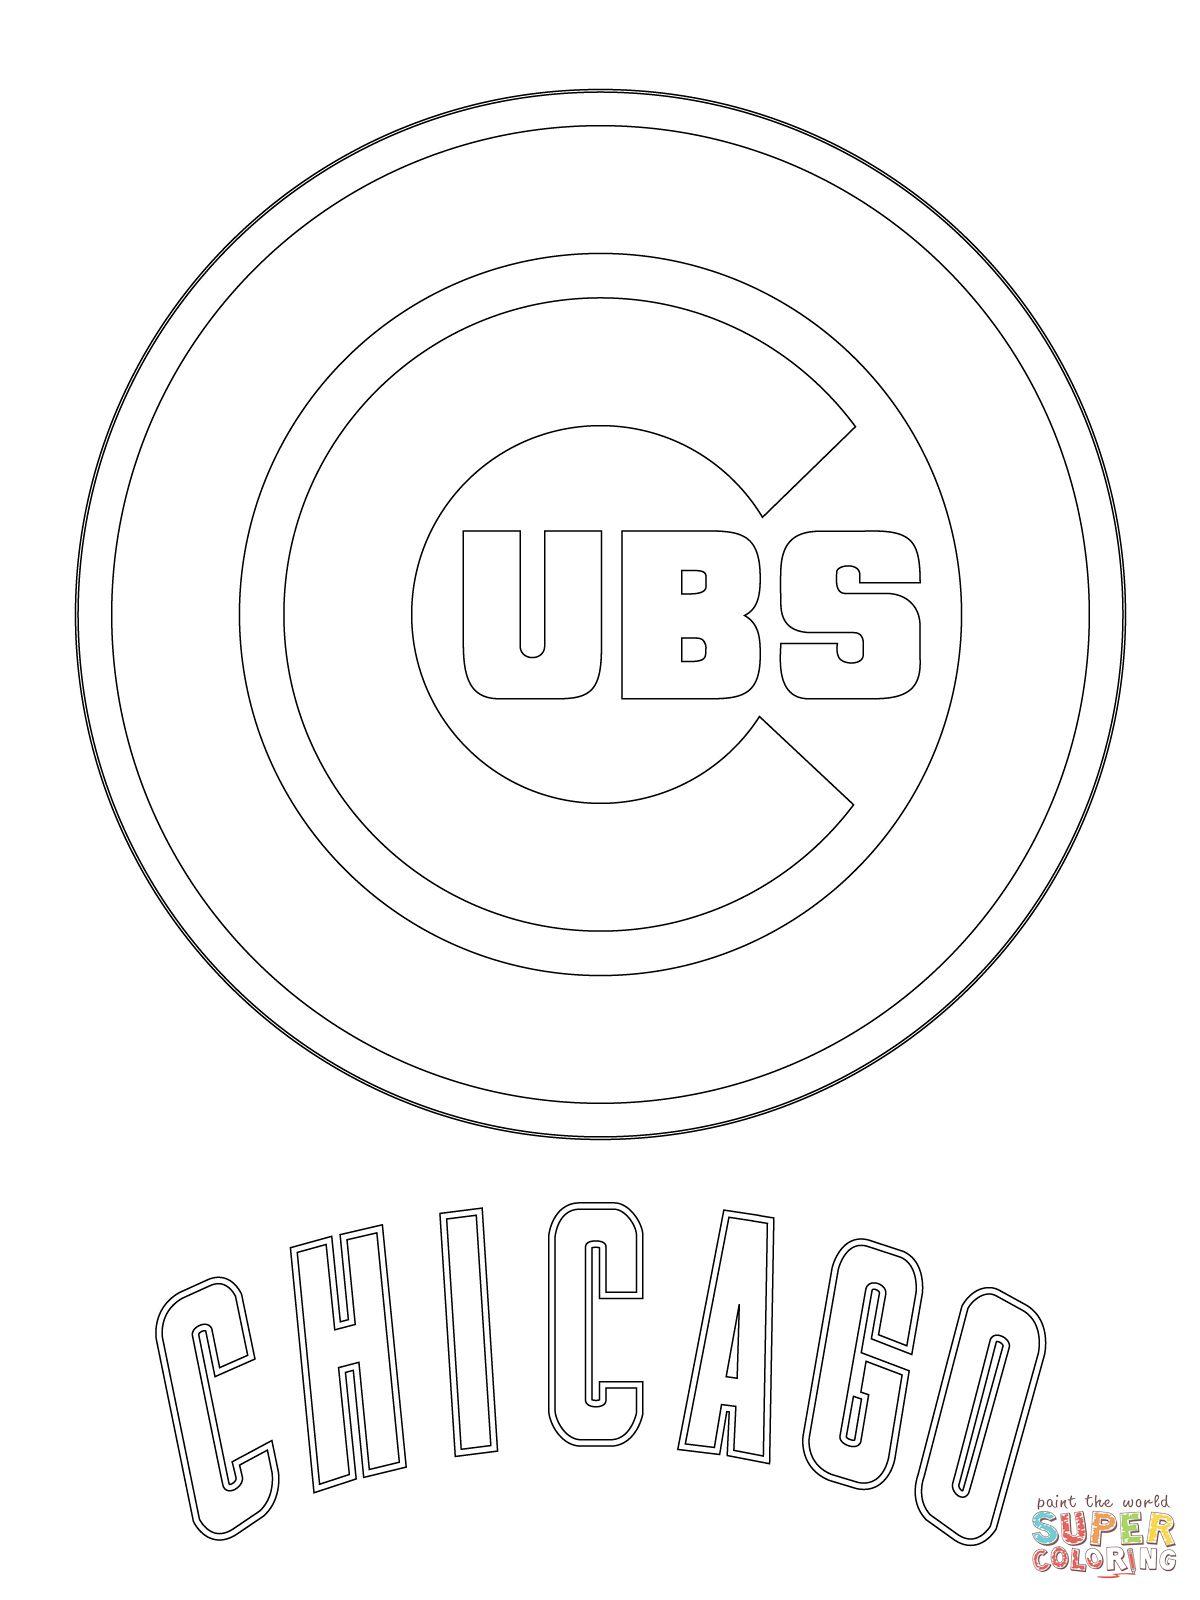 Chicago Cubs Logo Super Coloring Baseball Coloring Pages Coloring Pages Chicago Cubs